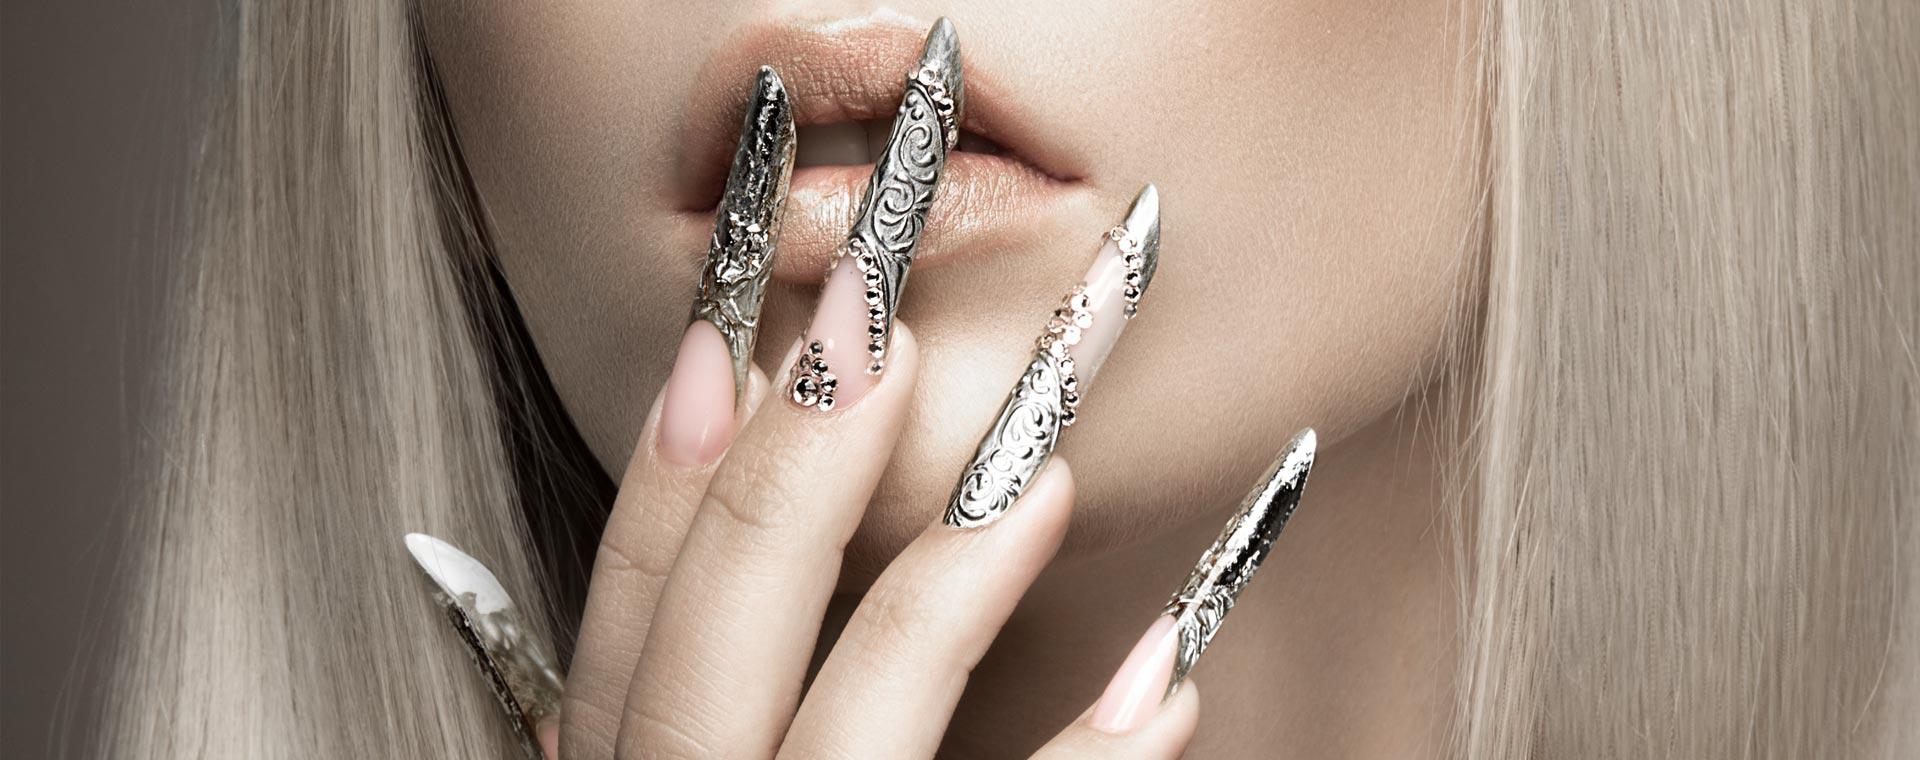 nails-ονυχοπλαστική-gianneri-academy